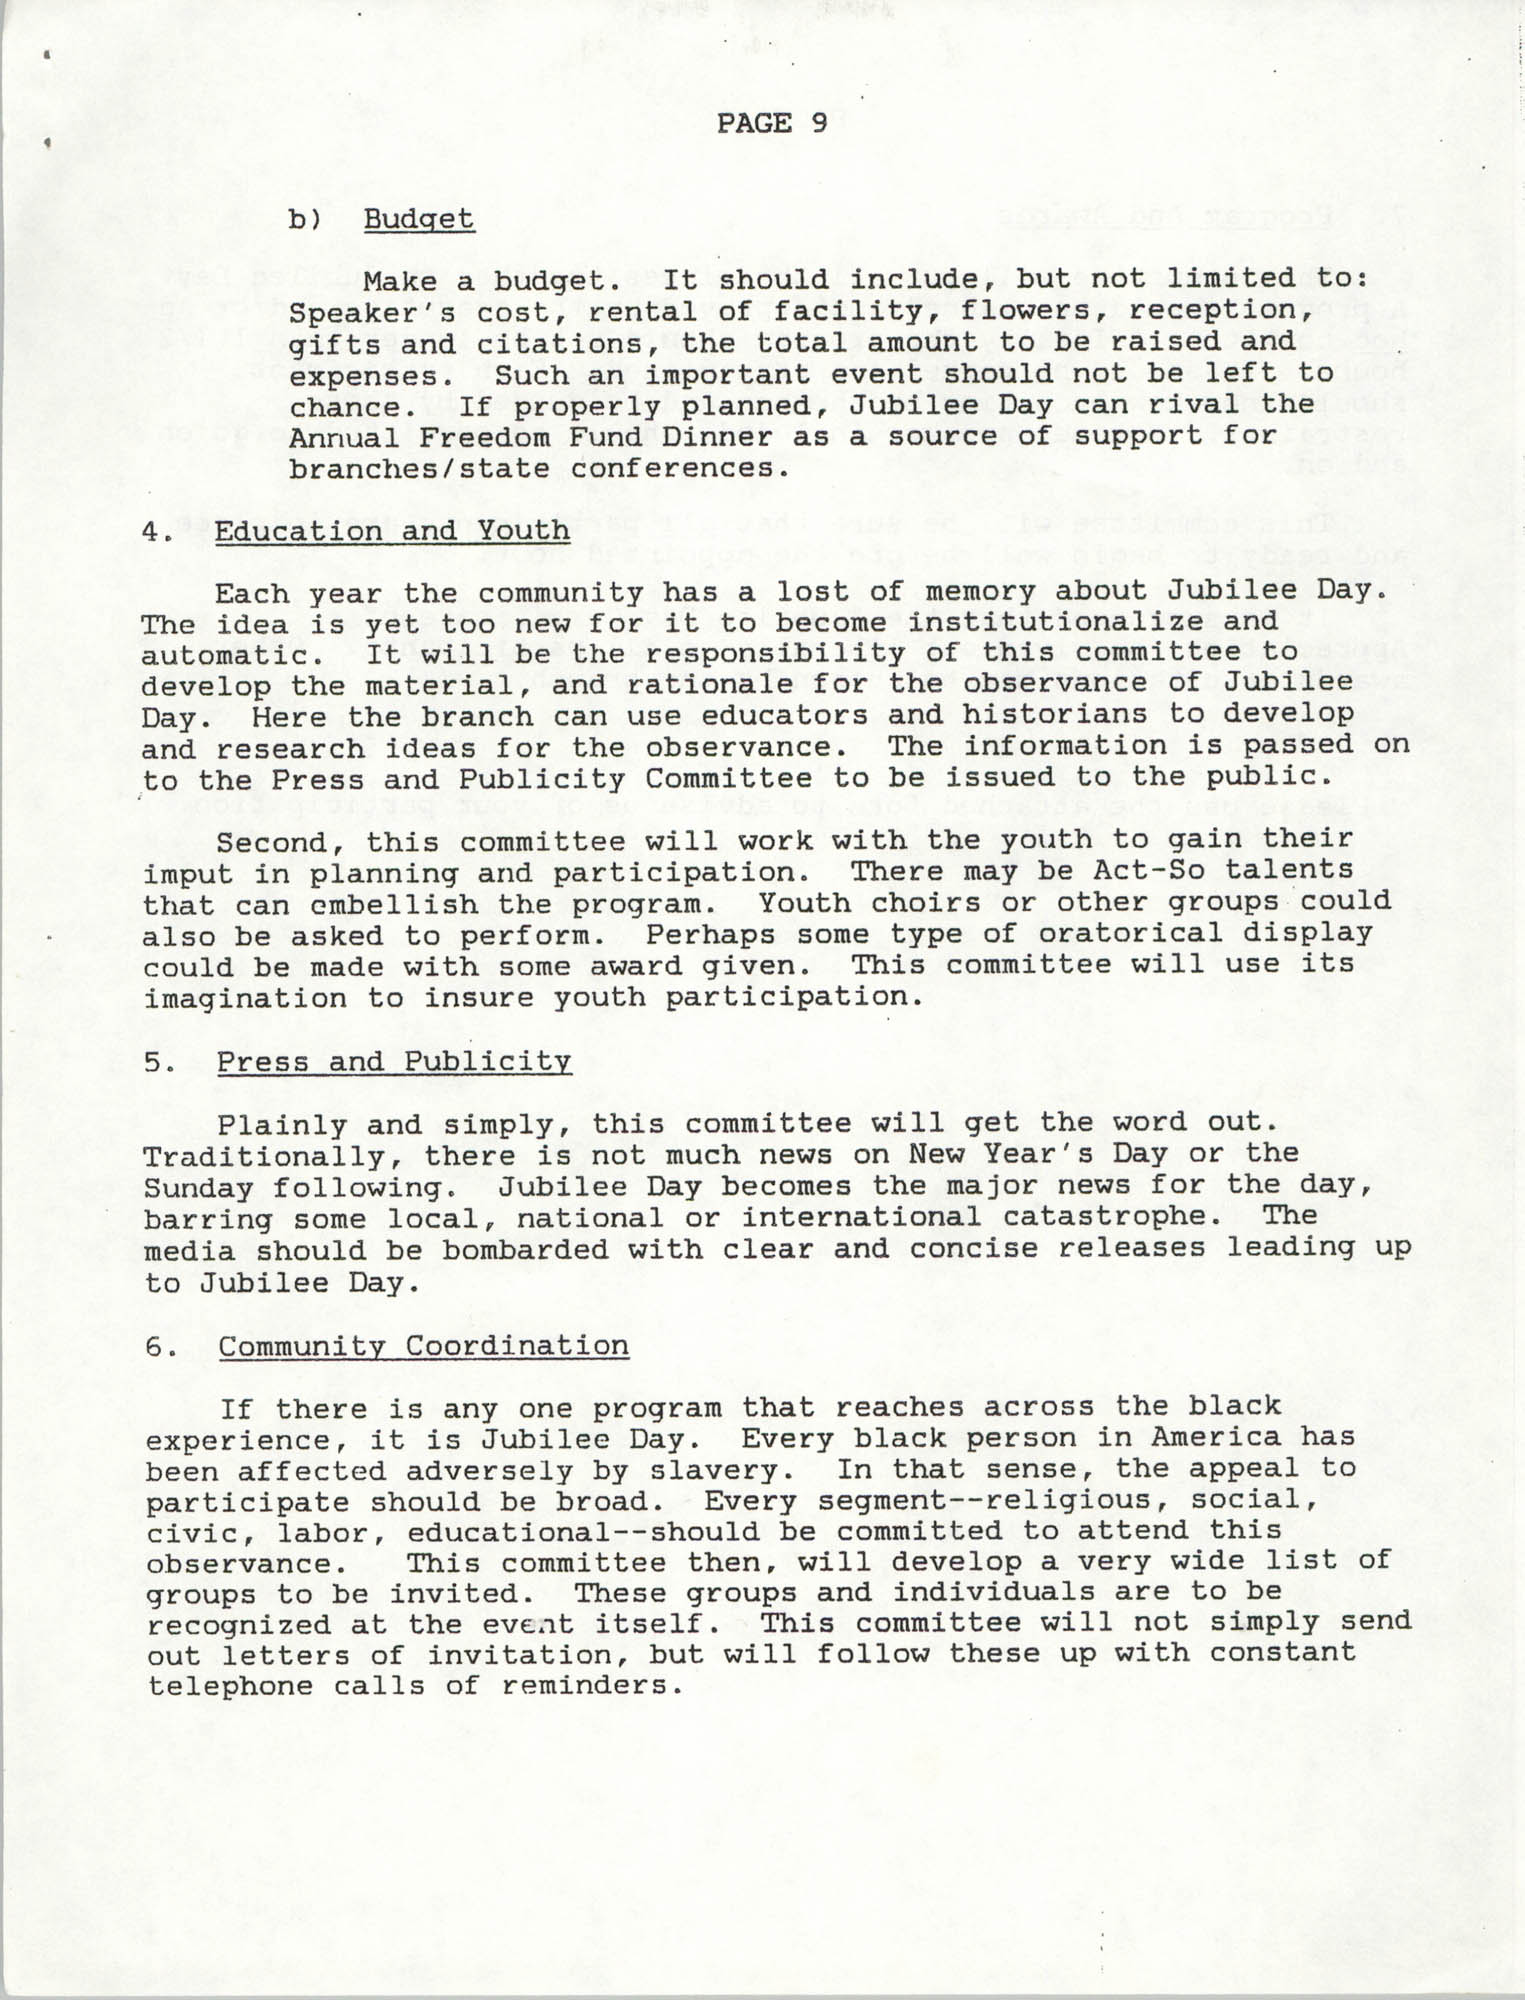 NAACP Memorandum, November 10, 1990, Page 9